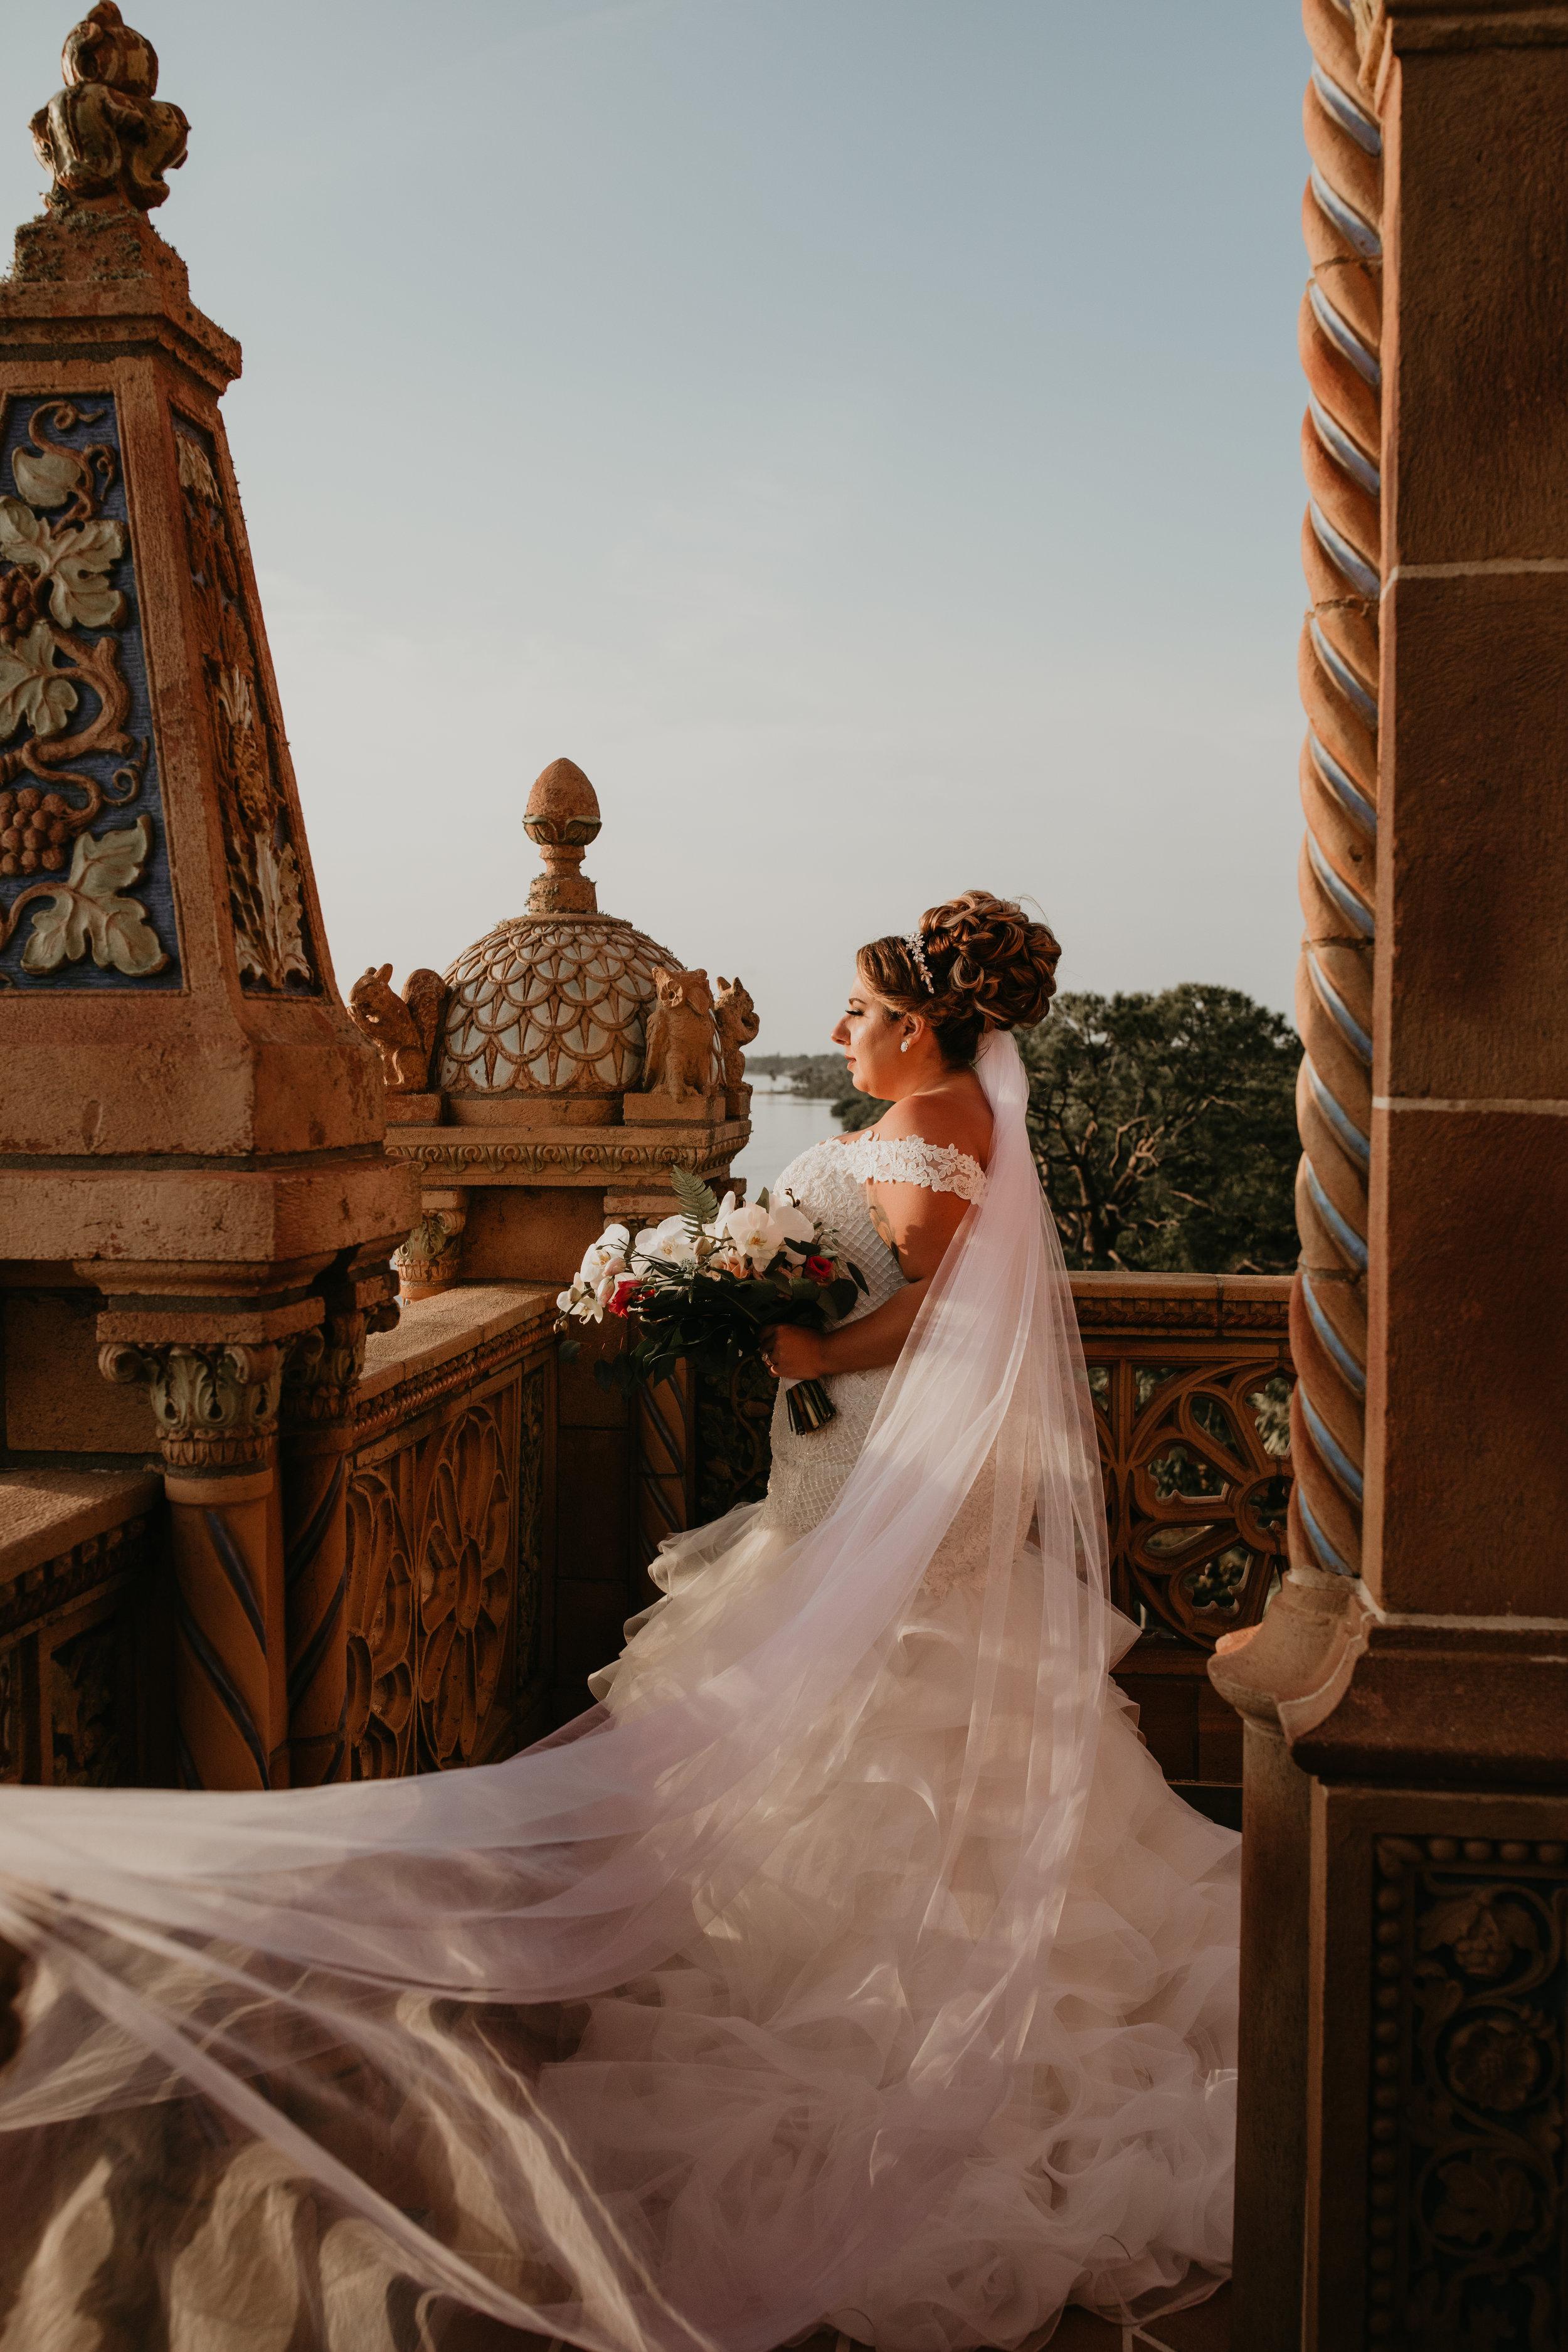 Ringling Museum Sarasota Florida-Wedding-Bianca and Michael88.JPG